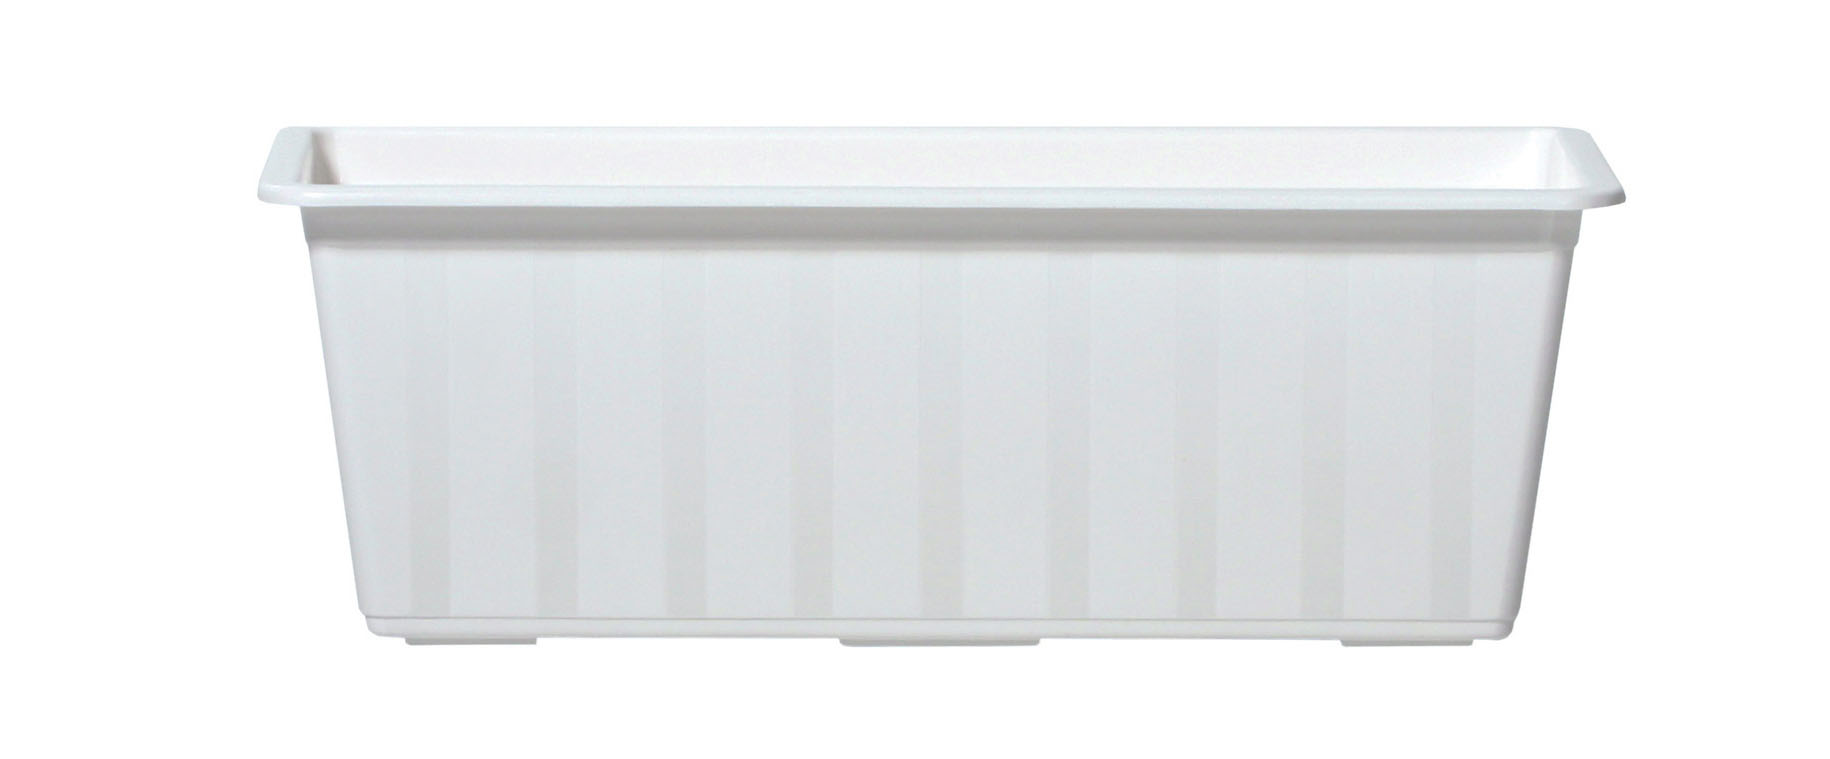 PROSPERPLAST Truhlík AGRO bílý 80cm